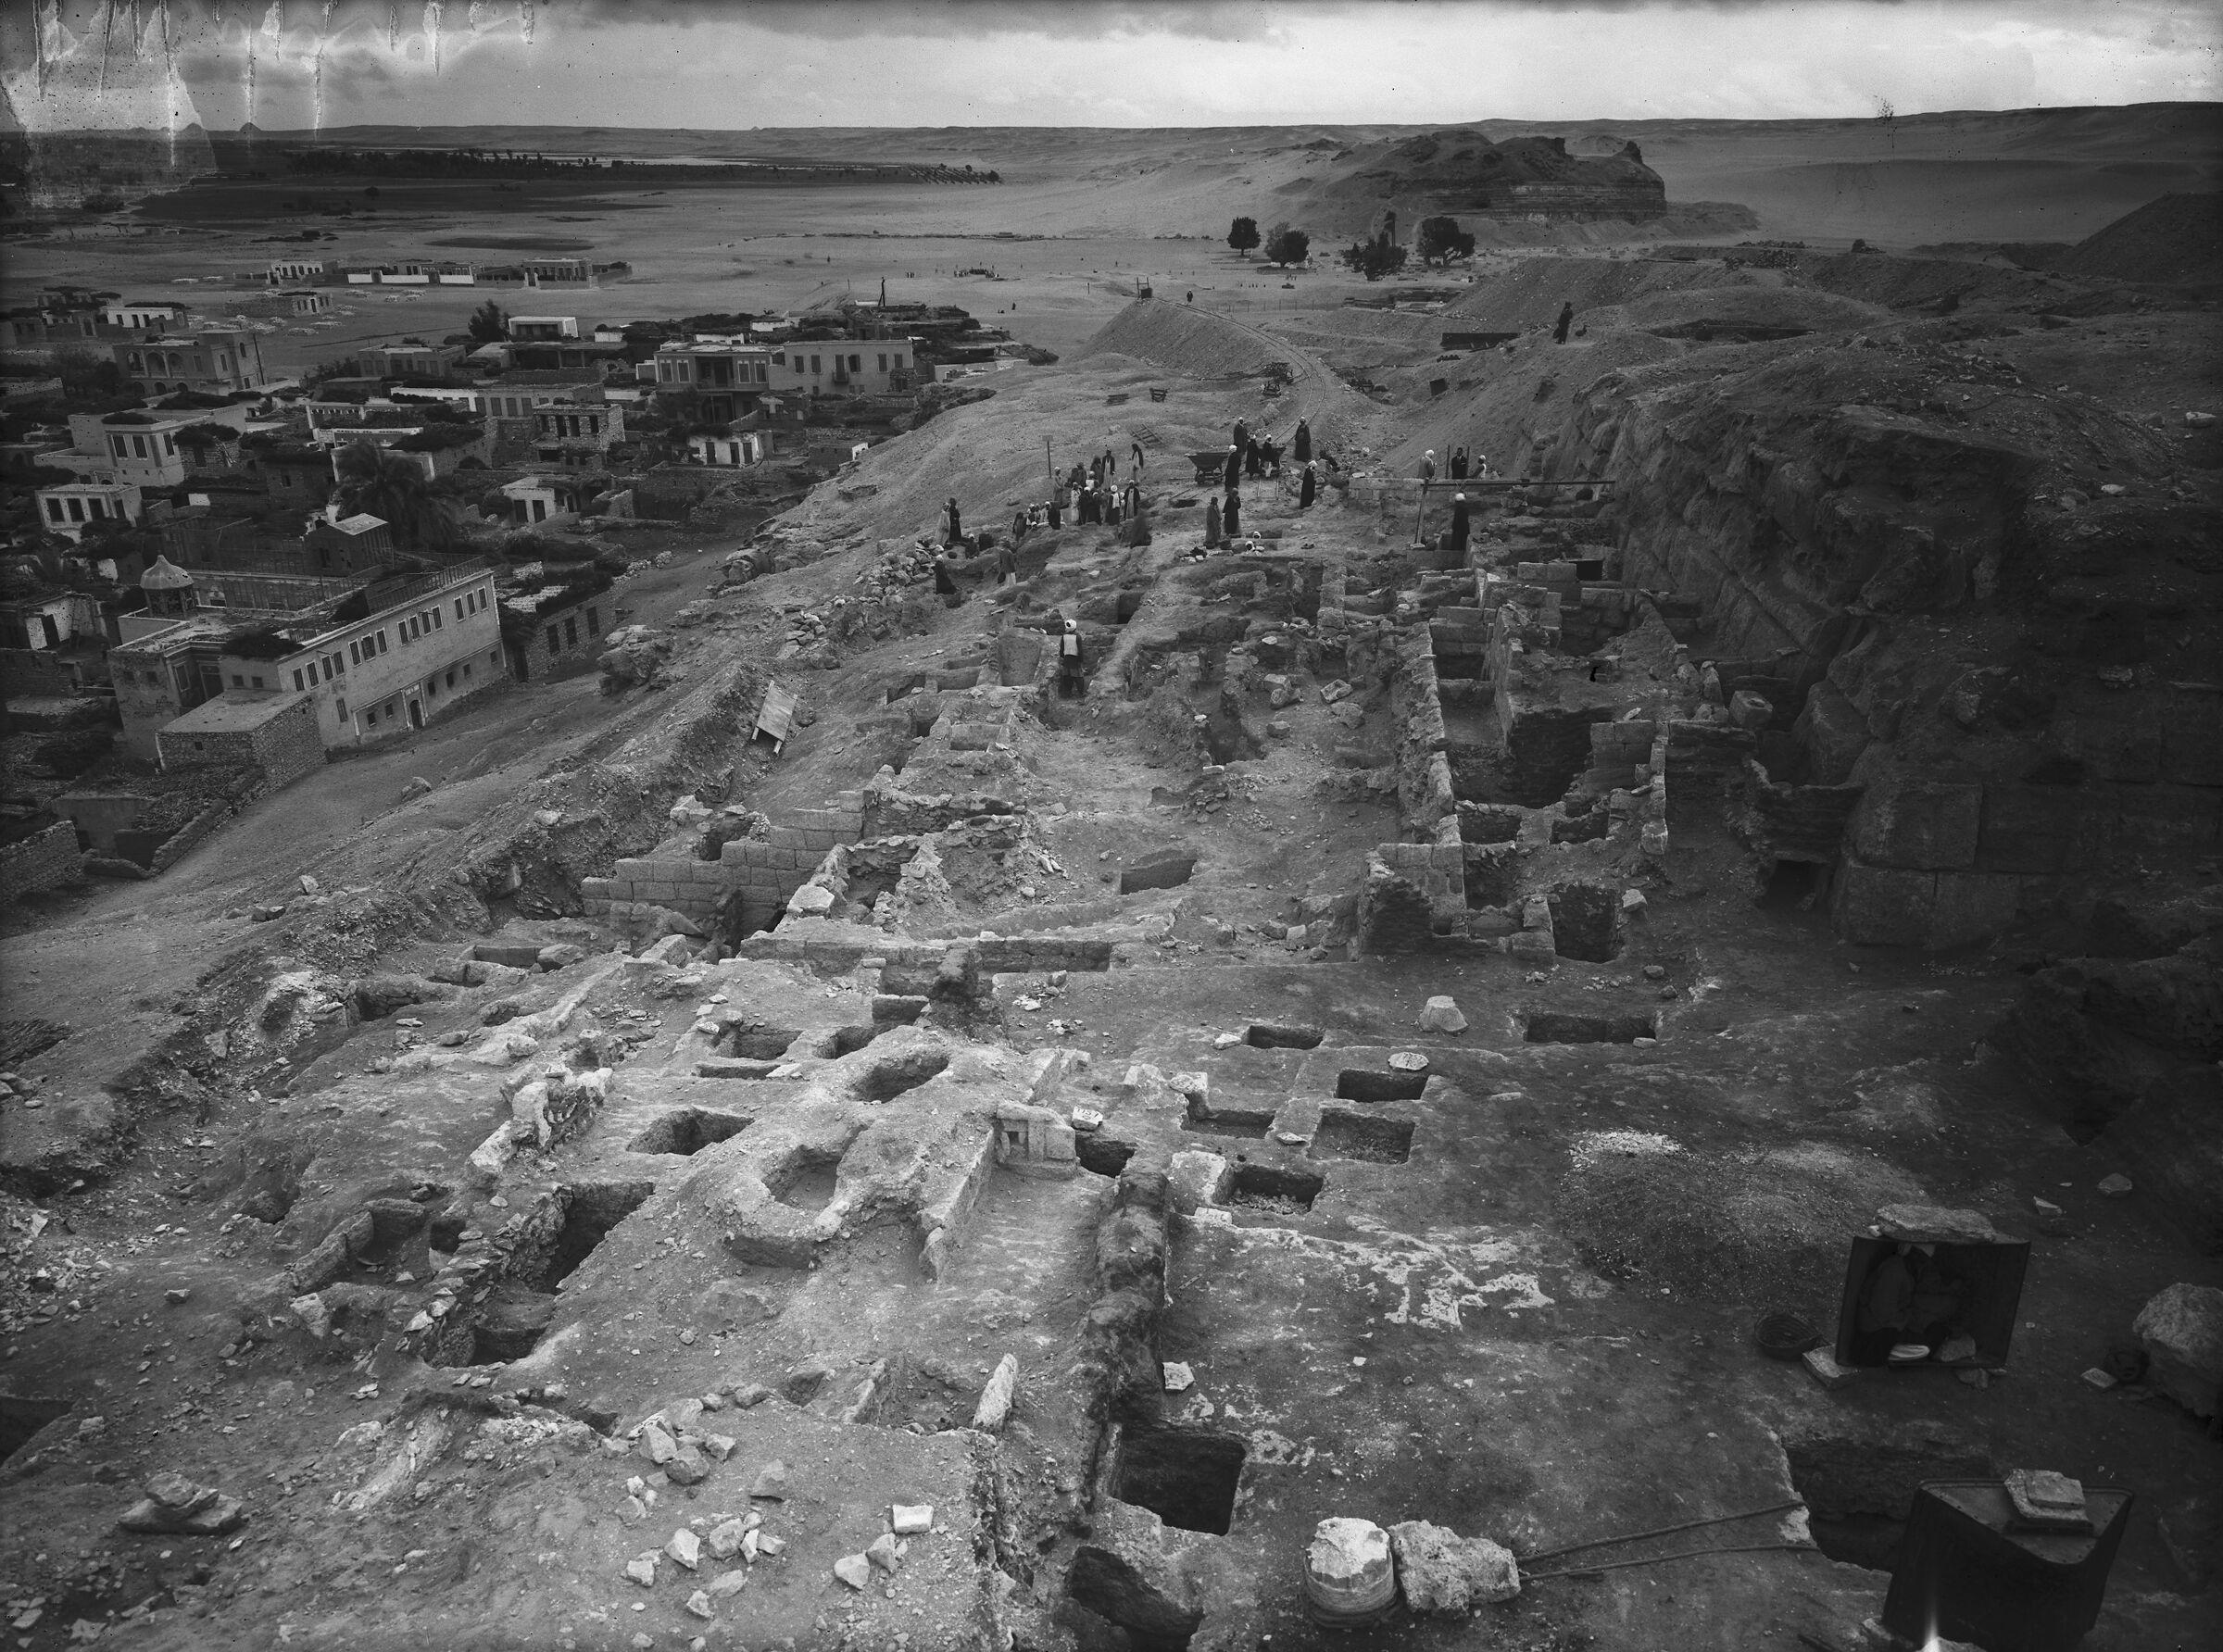 Eastern Cemetery: Site: Giza; View: street G 7700, G 7750, G 7760, G 7757, G 7755, G 7754, G 7753, G 7761, G 7762, G 7763, G 7764